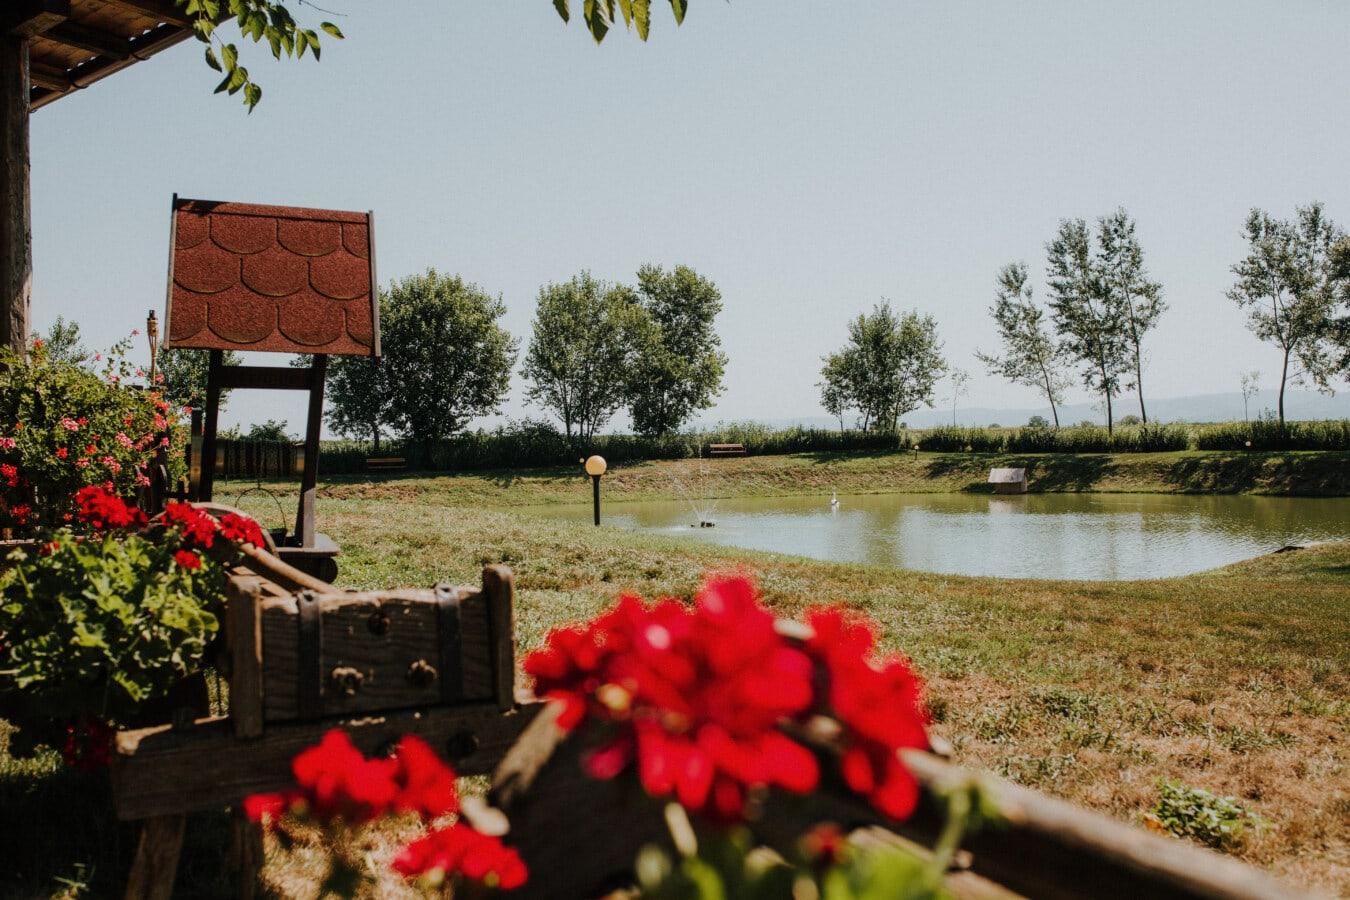 Dorf, Garten, Teich, Blumentopf, Blume, Natur, Struktur, Gras, Blatt, Sommer